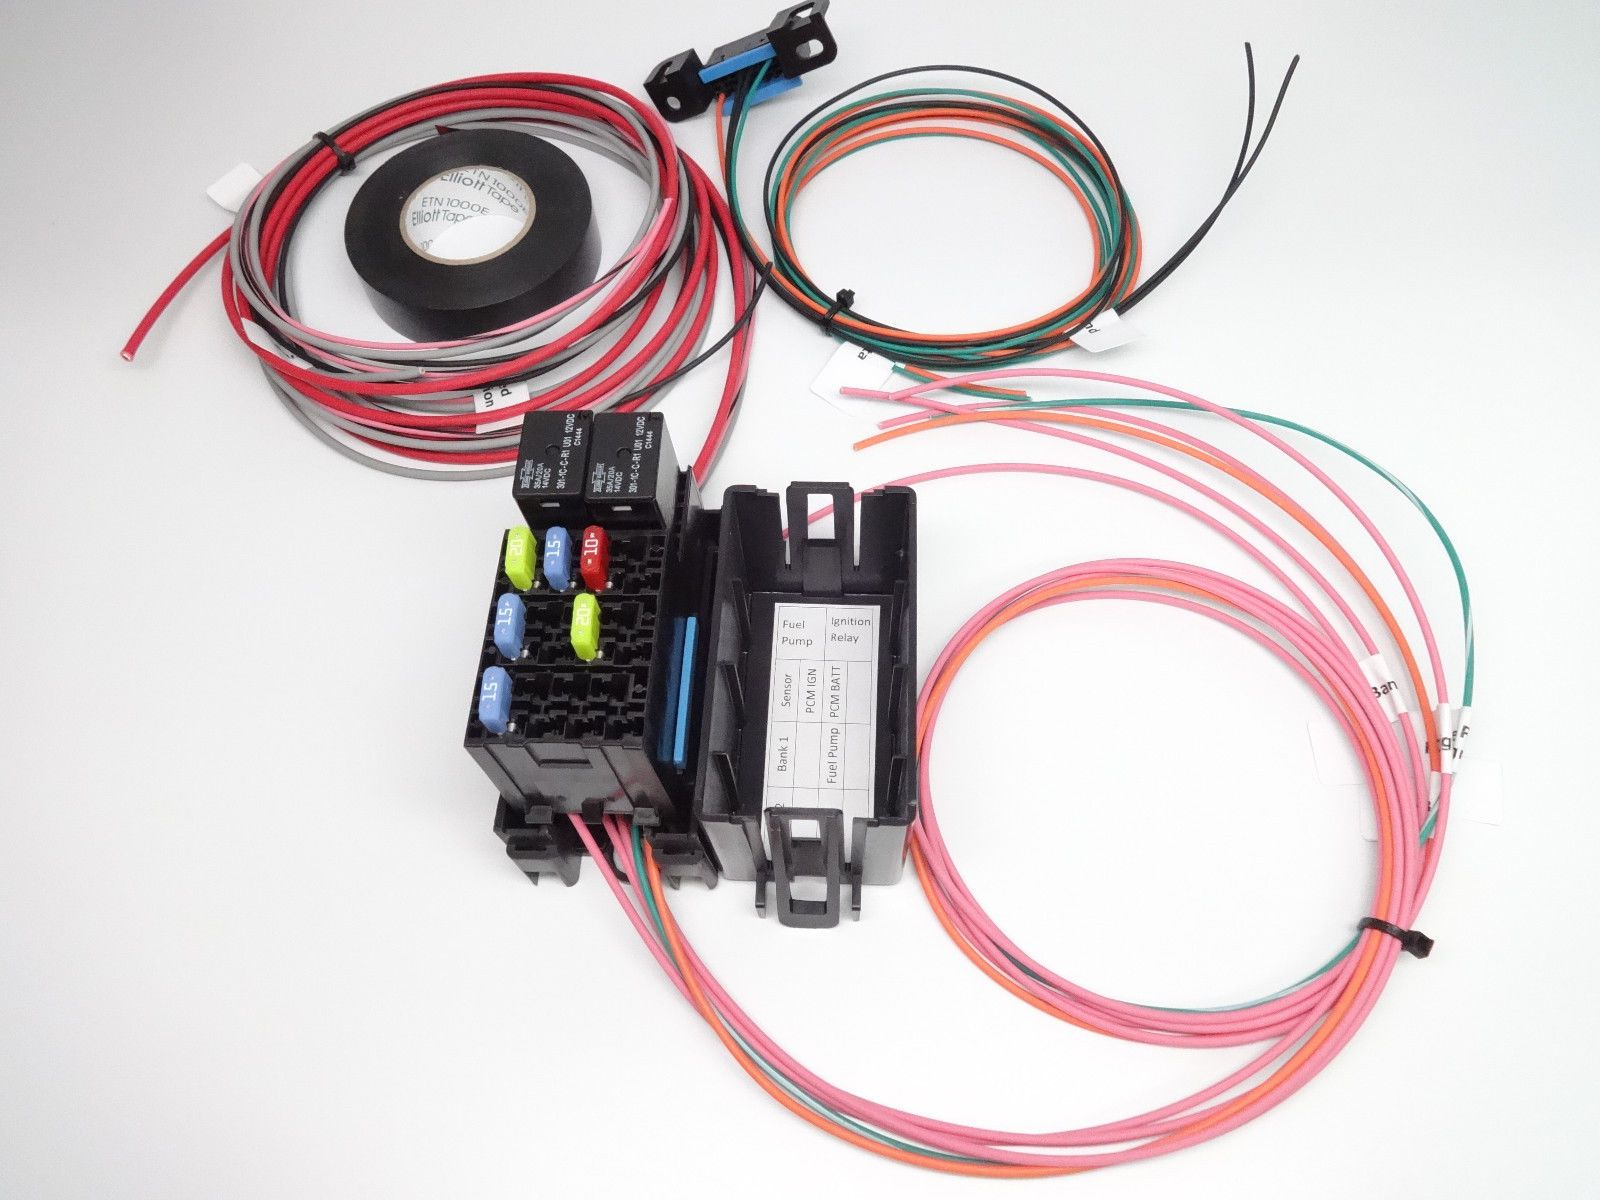 ls1 fuse box pins wiring library rh 73 codingcommunity de fuse profire sight fuse pin pylon [ 1600 x 1200 Pixel ]